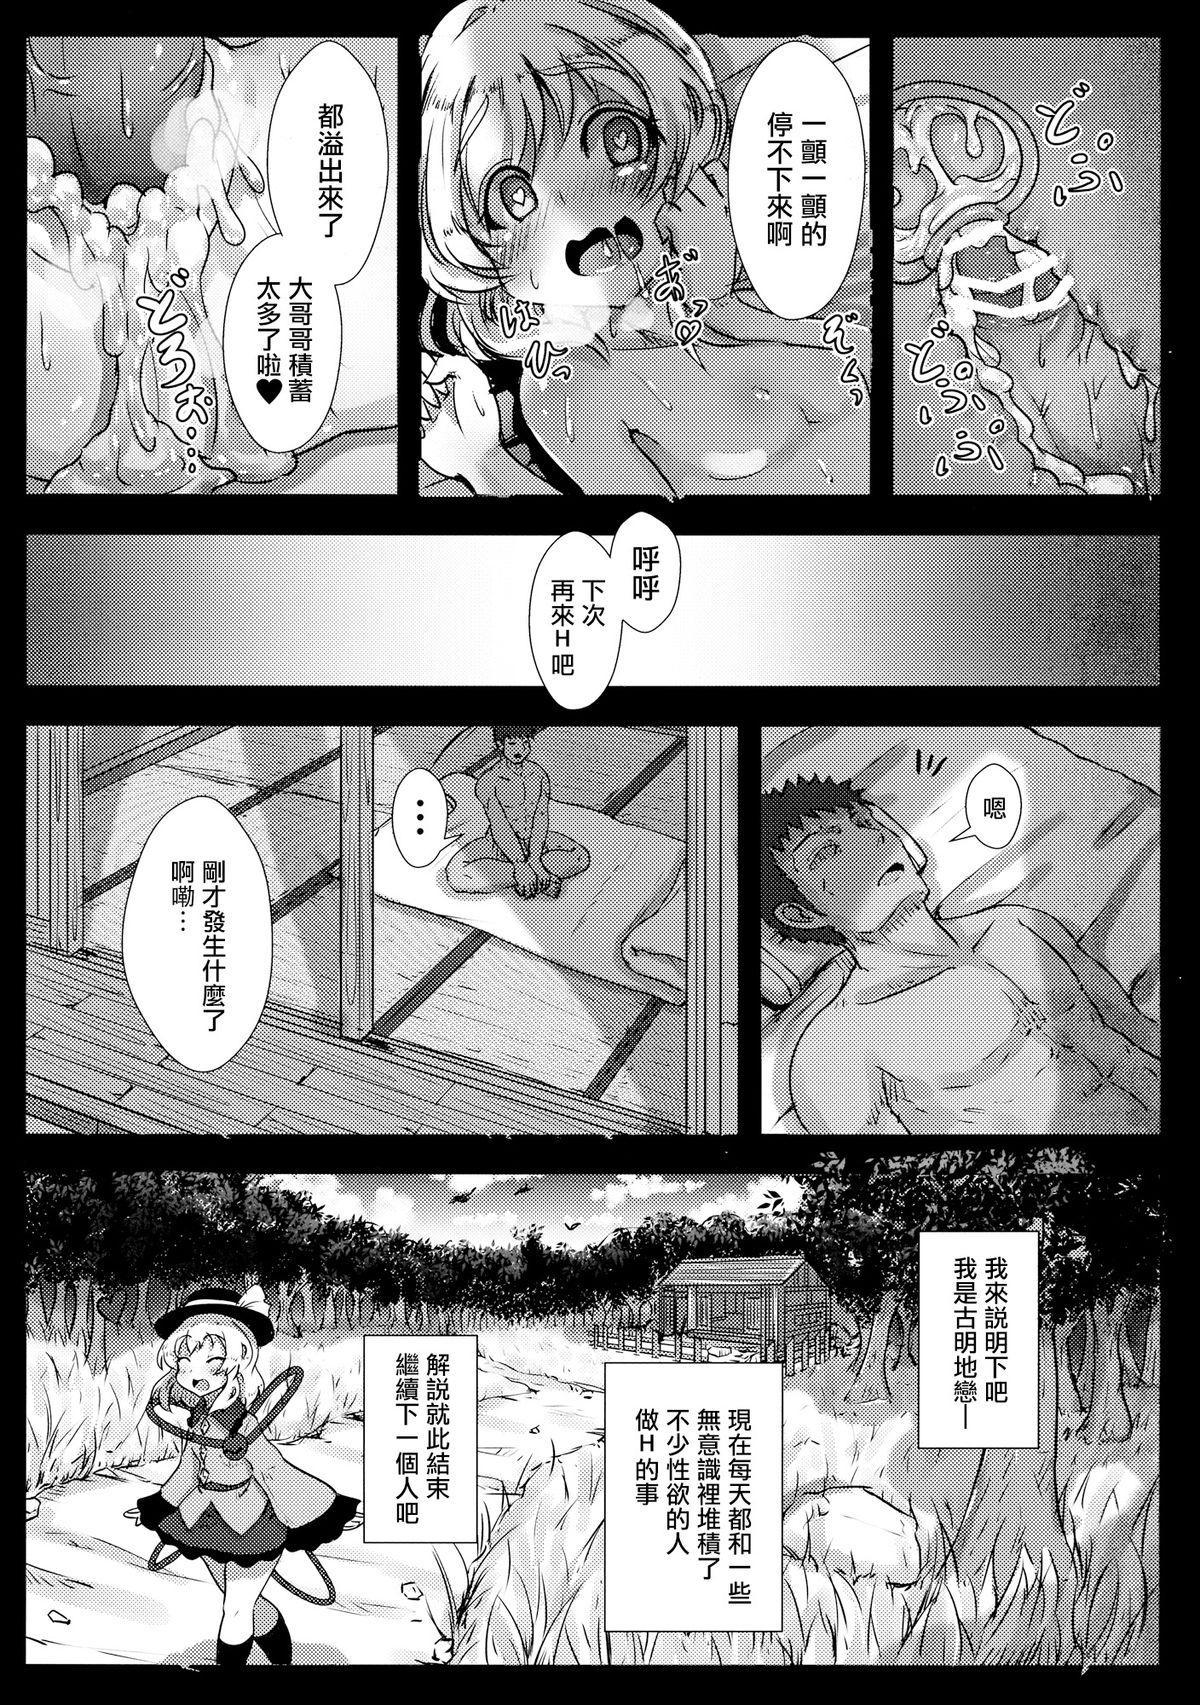 Koishi-chan no Ecchi na Mainichi 5